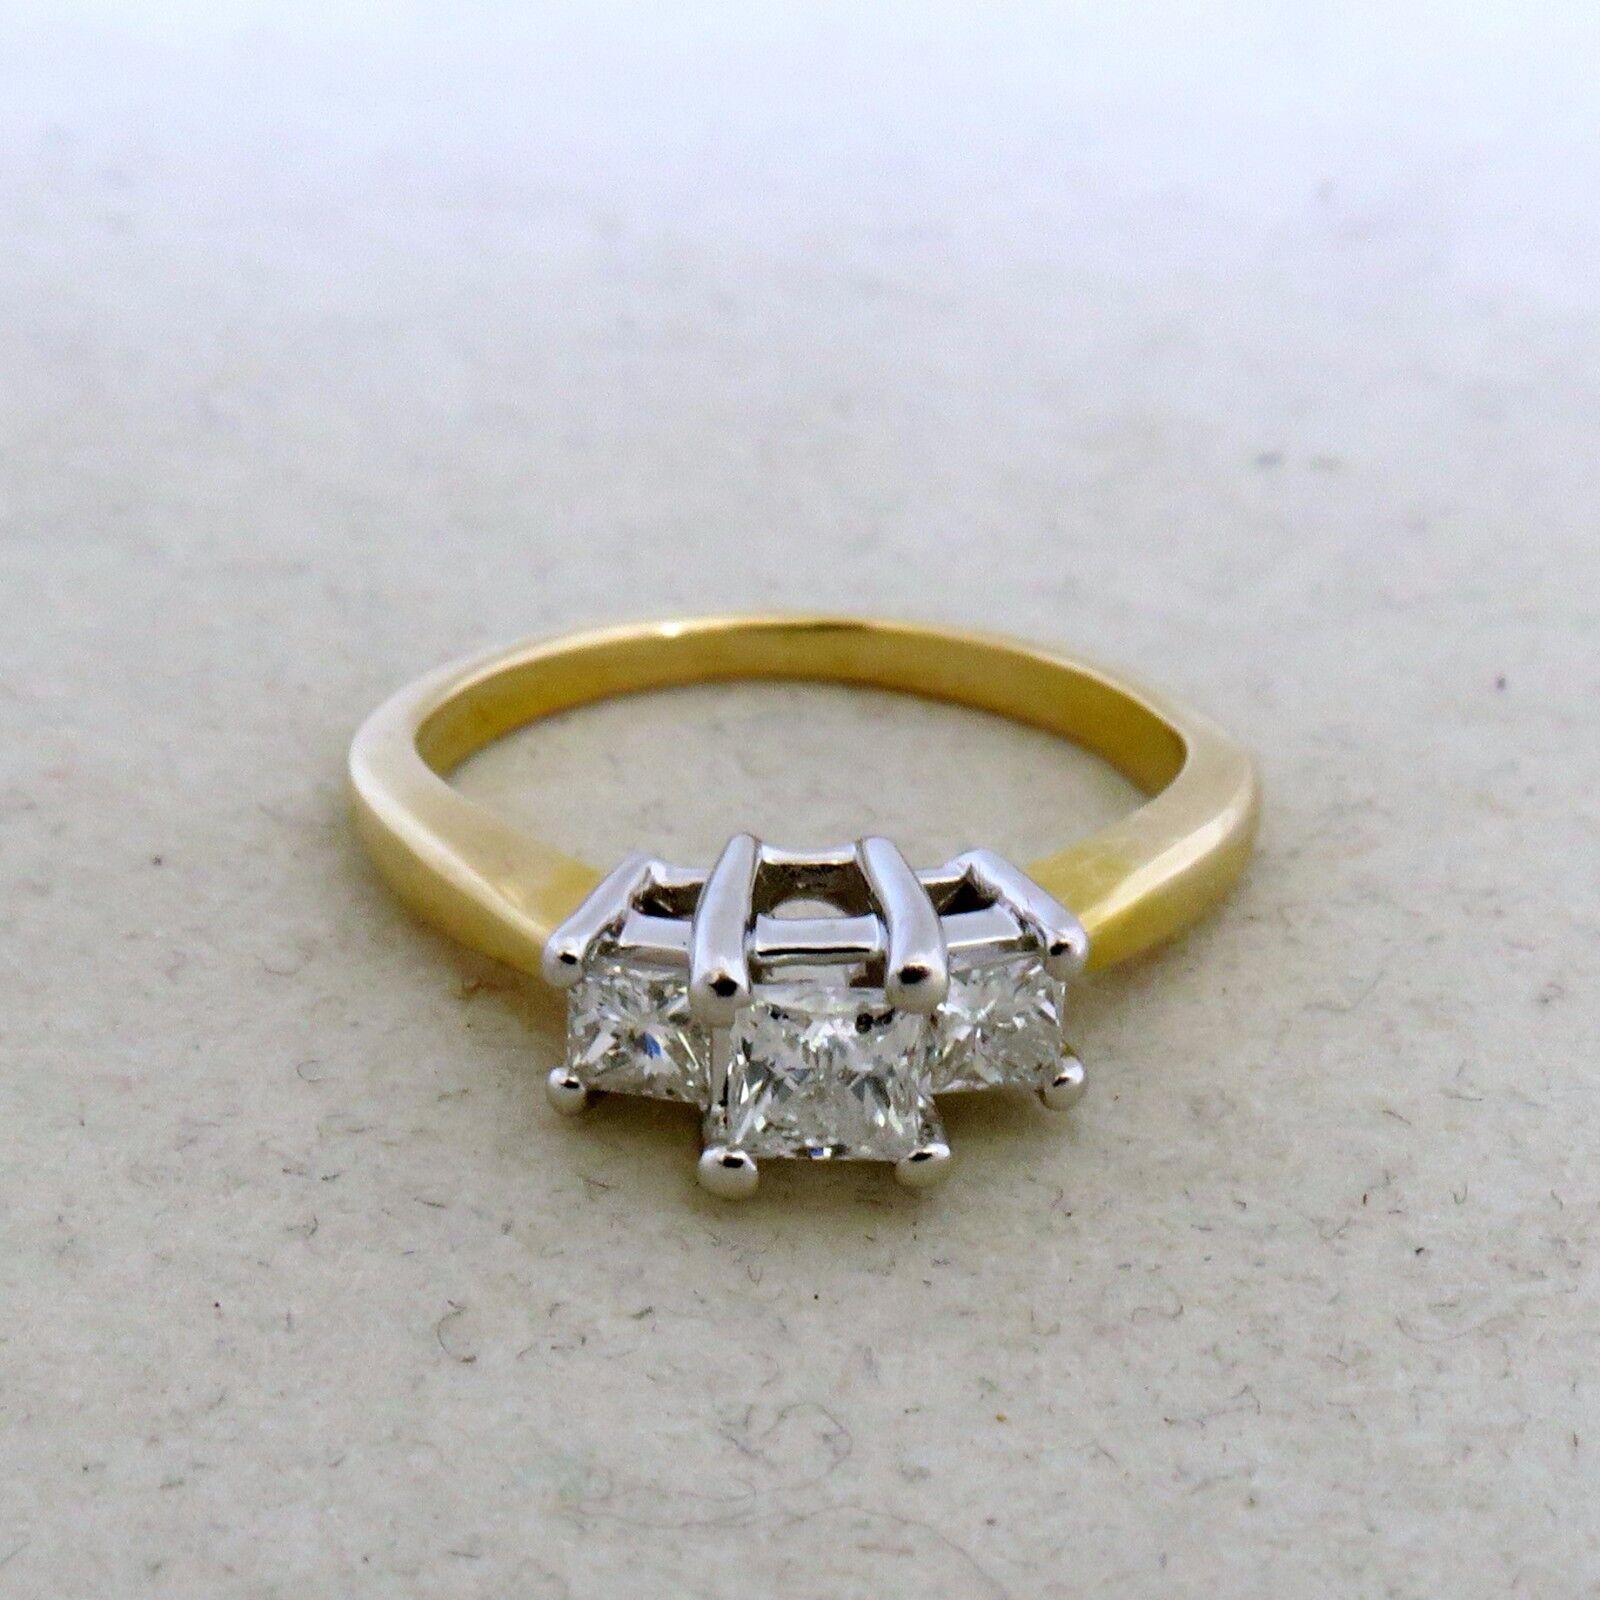 14K Yellow gold Engagement Ring w  3 Princess Diamonds  .55 Carats (size 5.25)